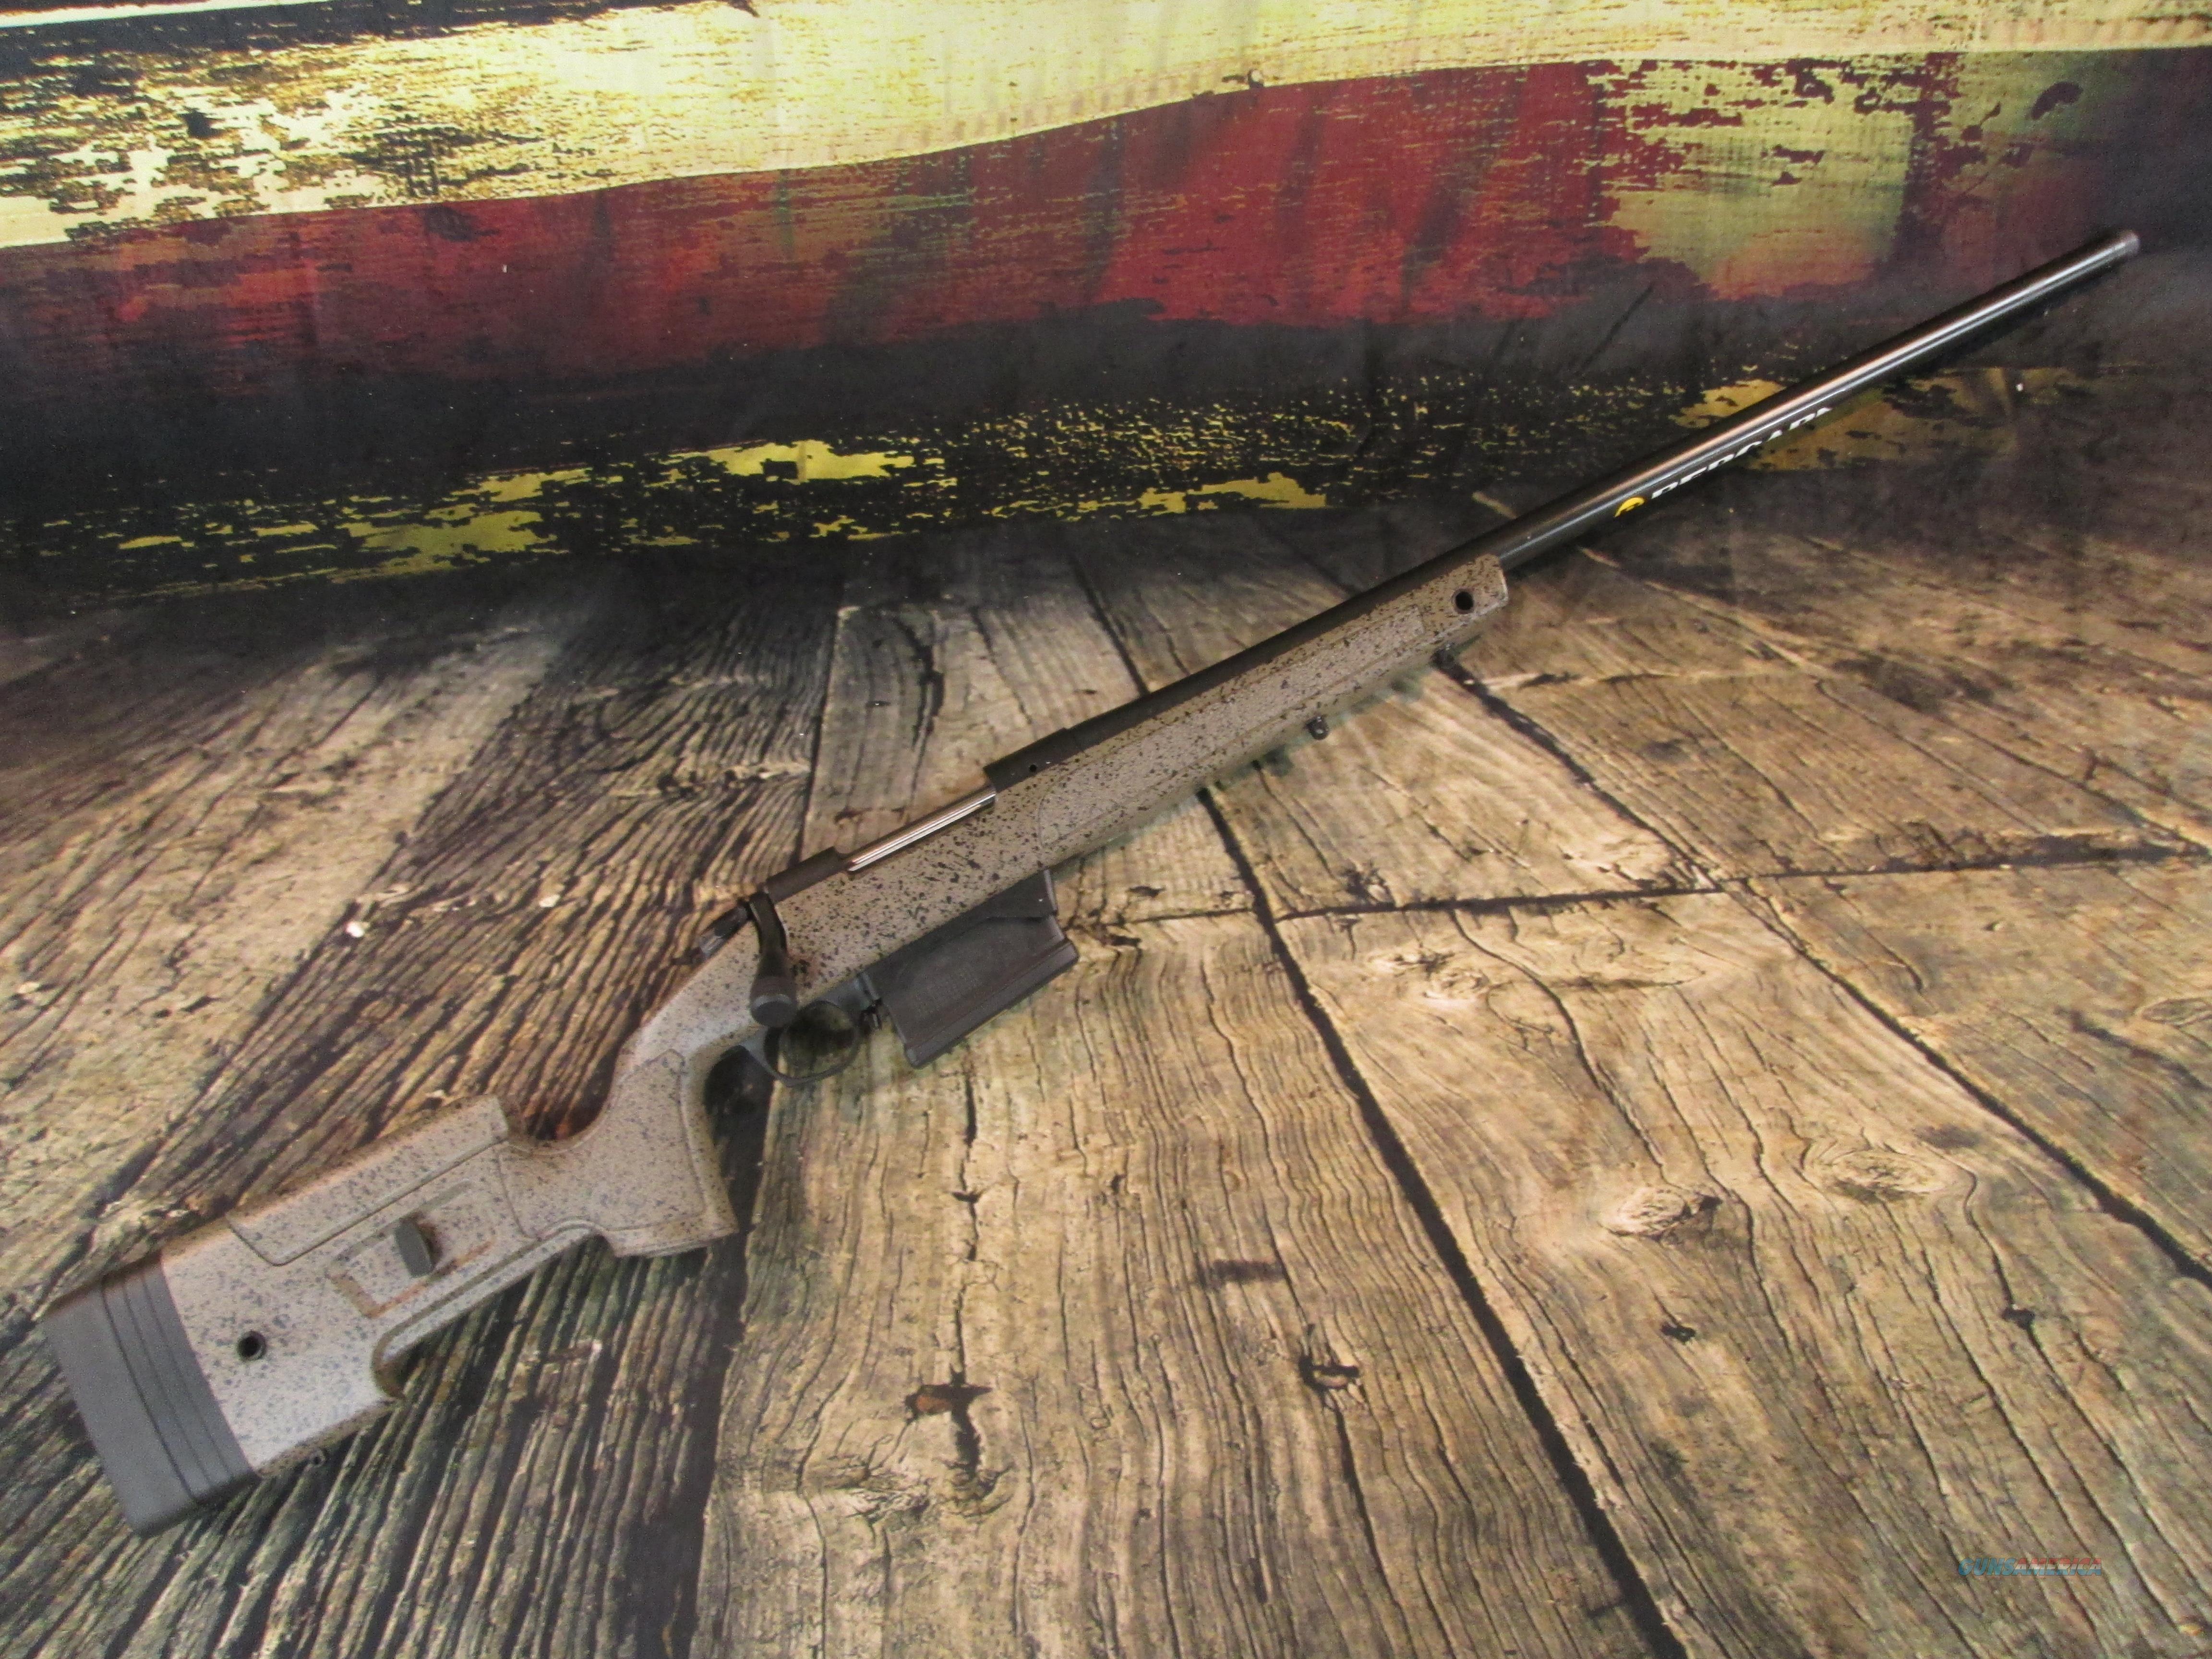 Bergara B-14 HMR Bolt 300 Win Mag NEW (B14LM301)   Guns > Rifles > Bergara Rifles